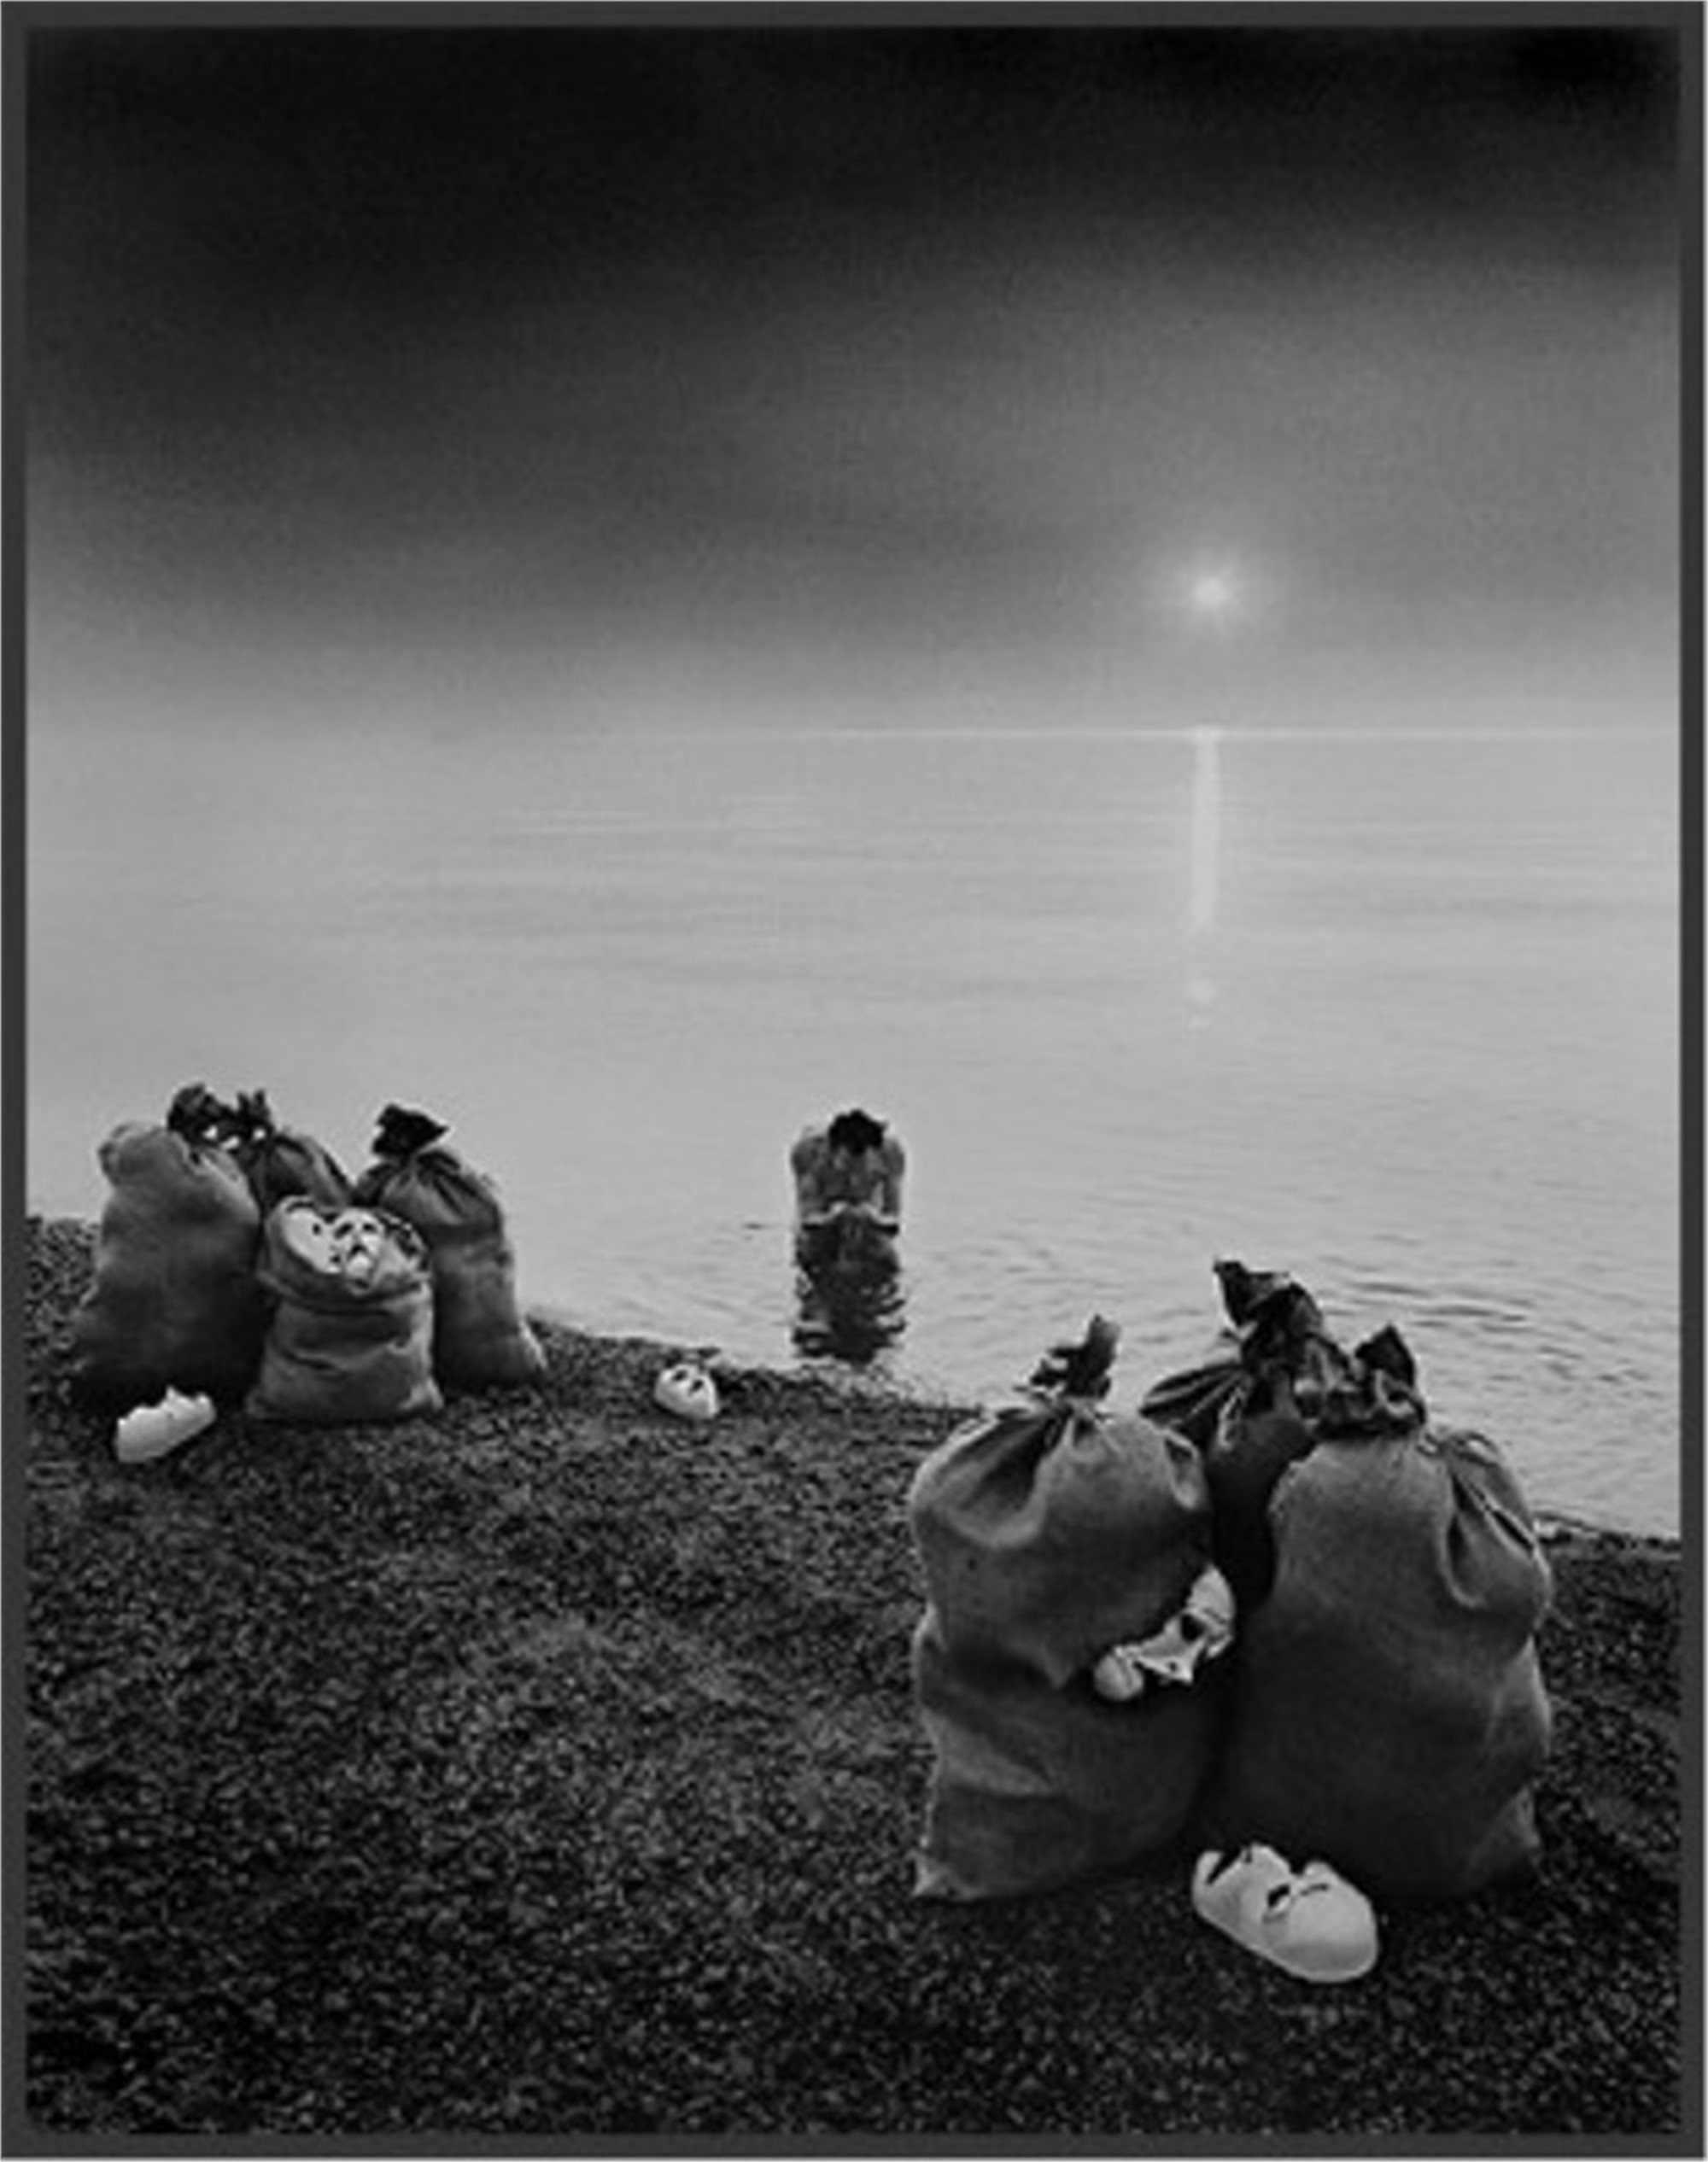 Renunciation by Misha Gordin